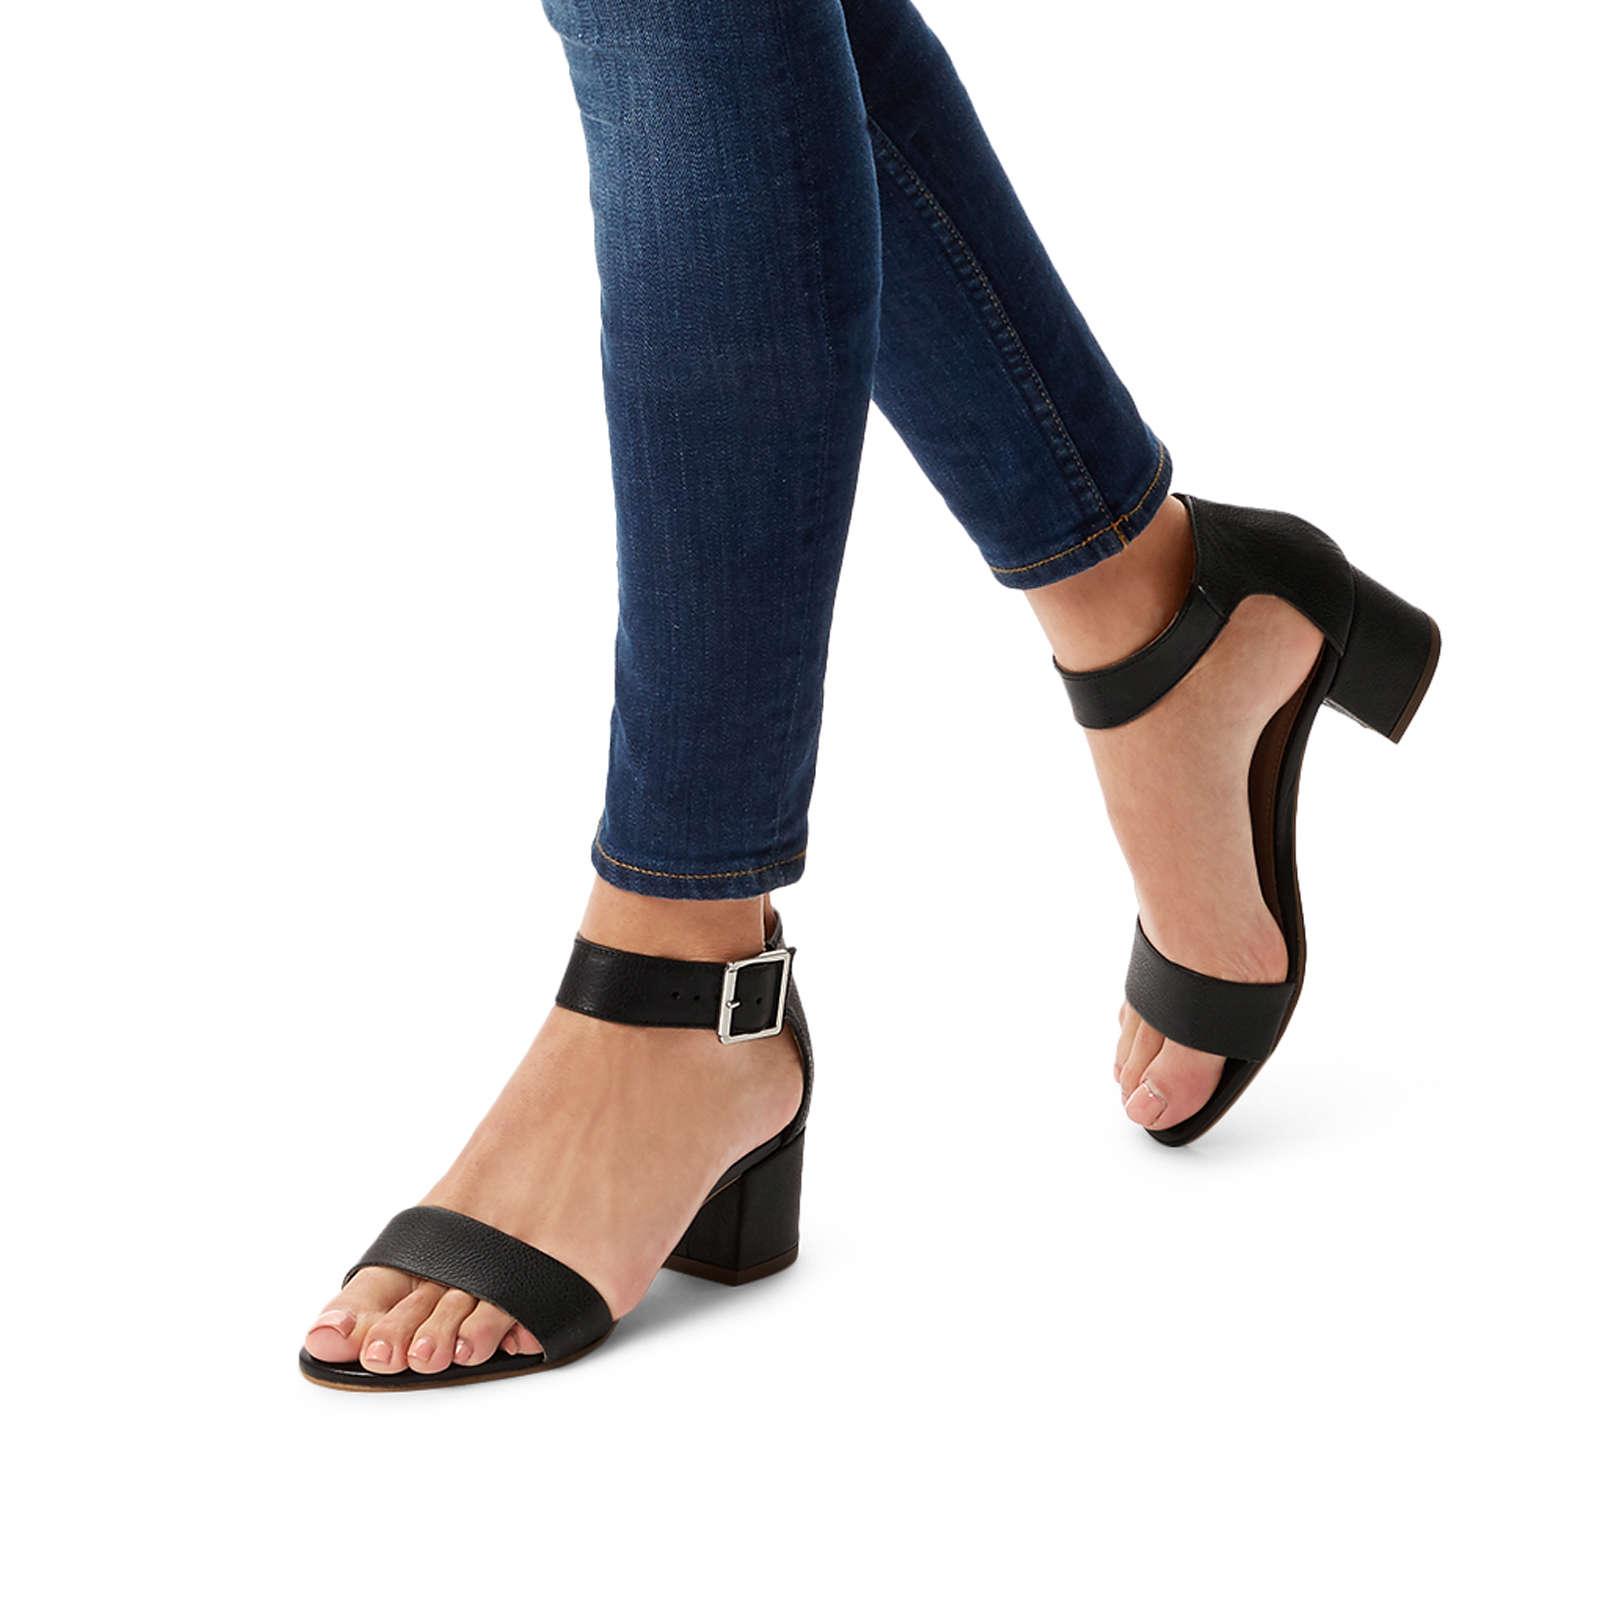 c02cd970a1a9 SHADOW Carvela Shadow Black Leather Sandals Block Heel by CARVELA